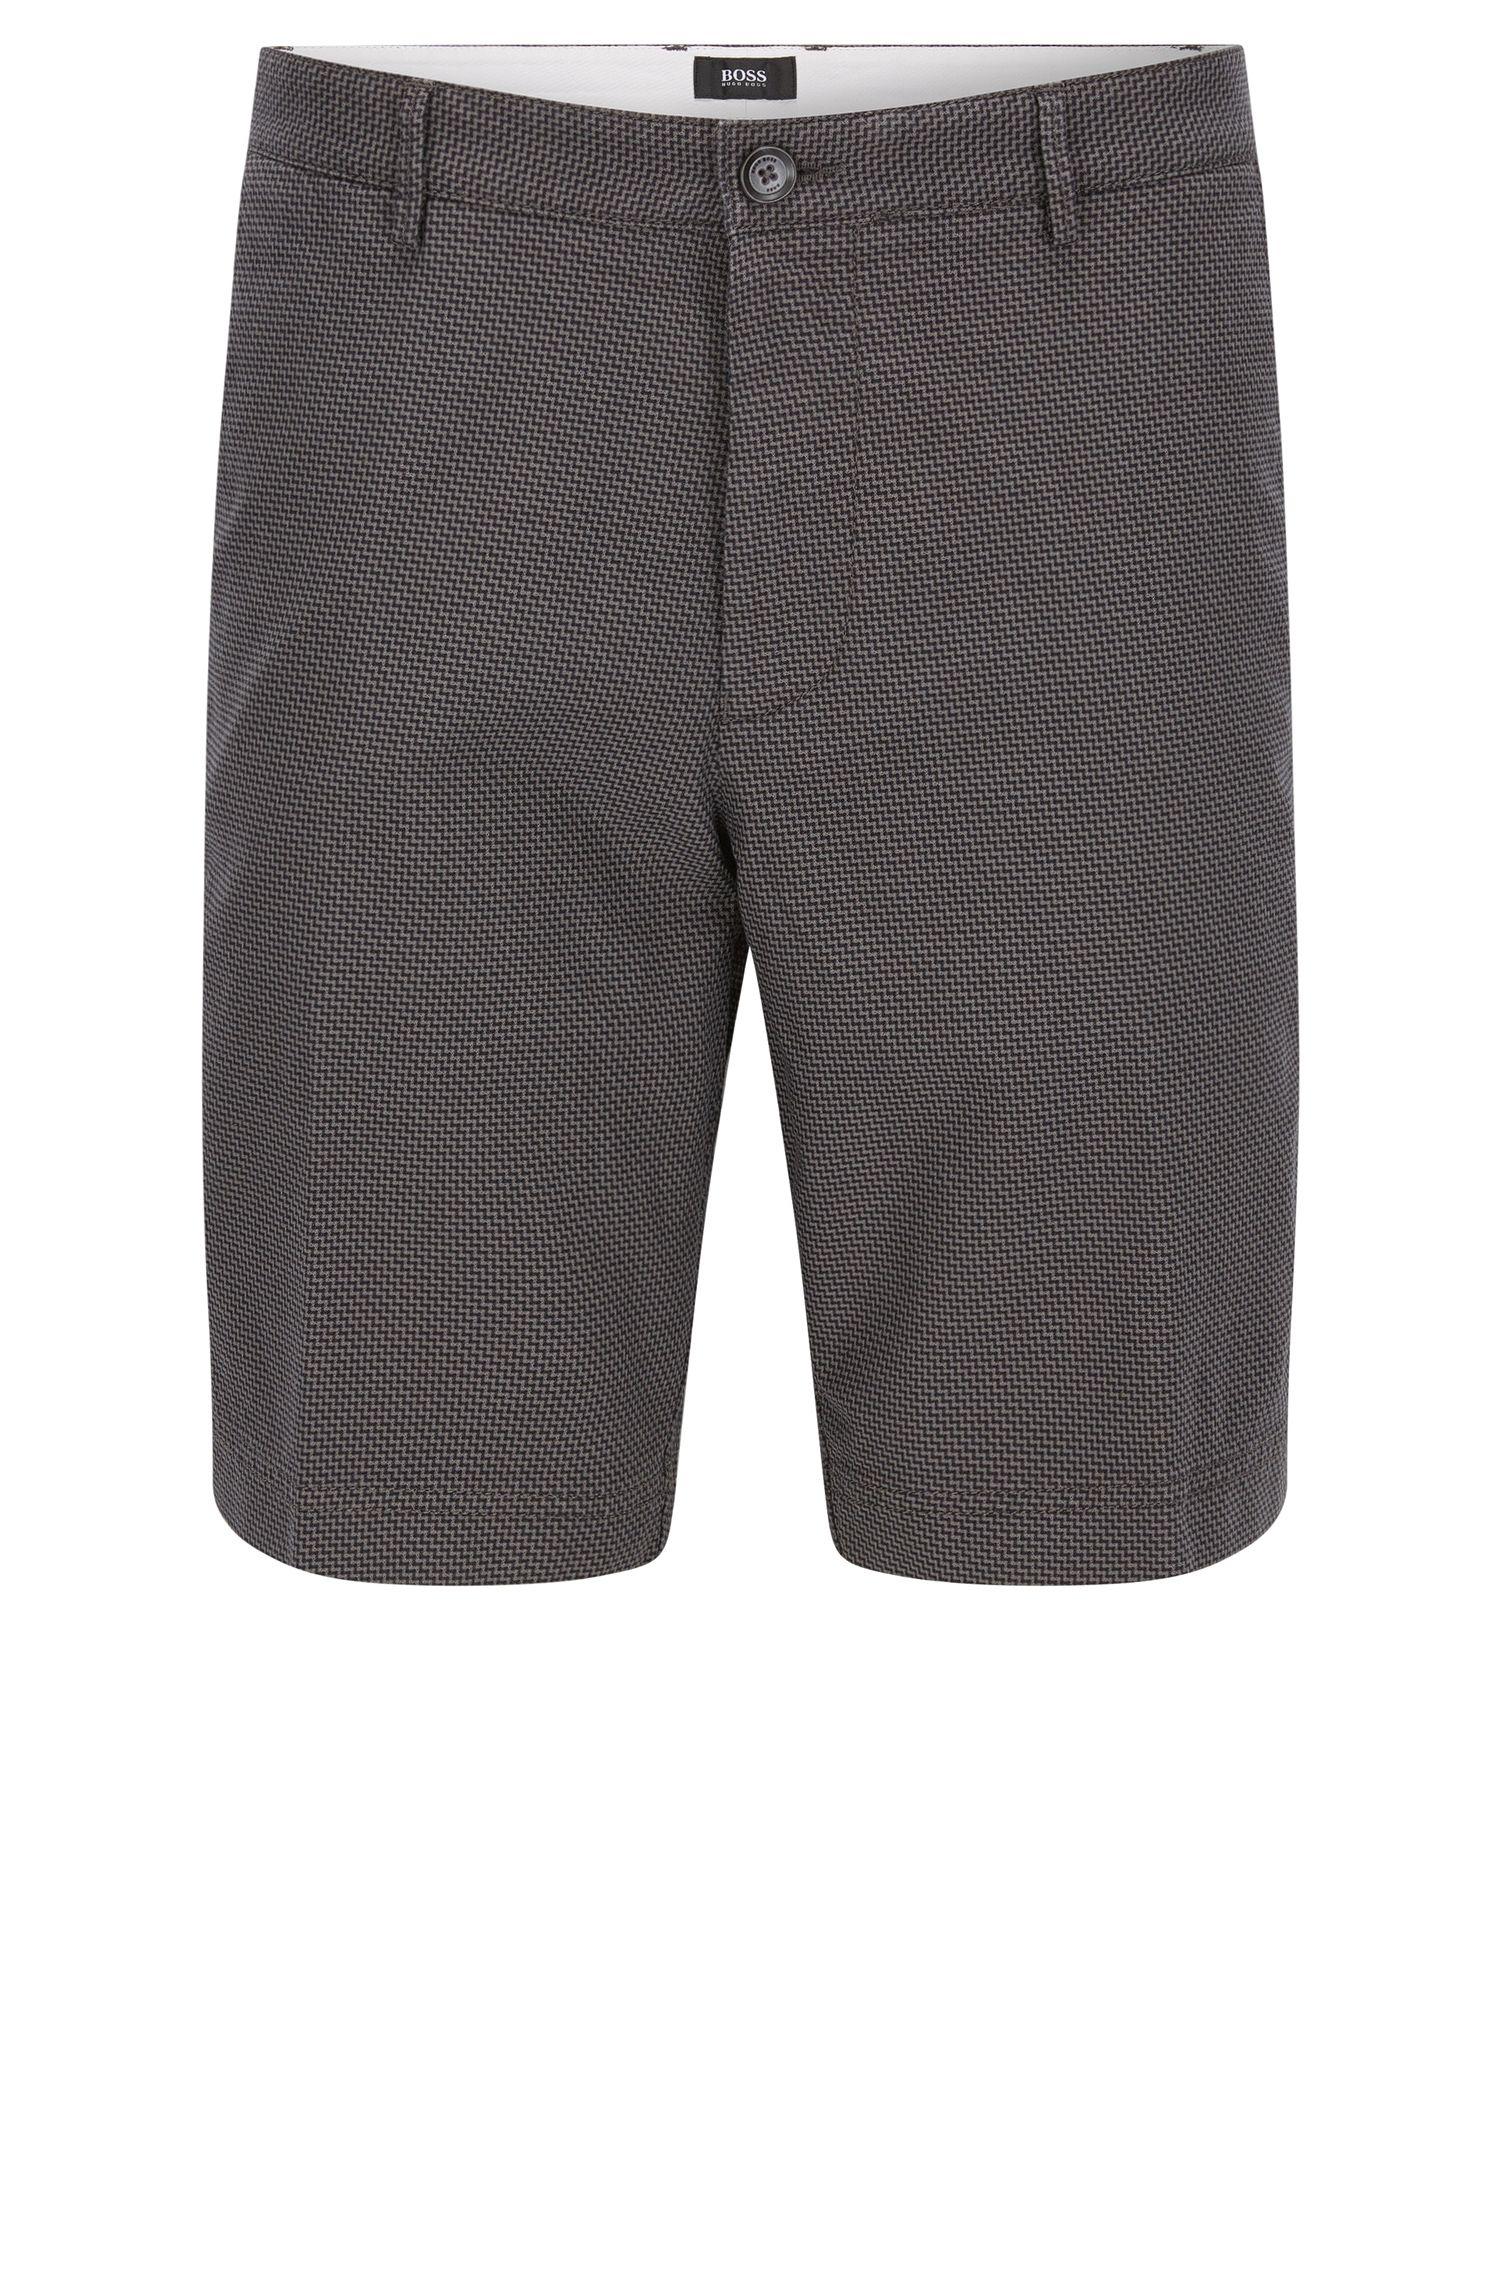 'Crigan Short W' | Regular Fit, Stretch Cotton Shorts